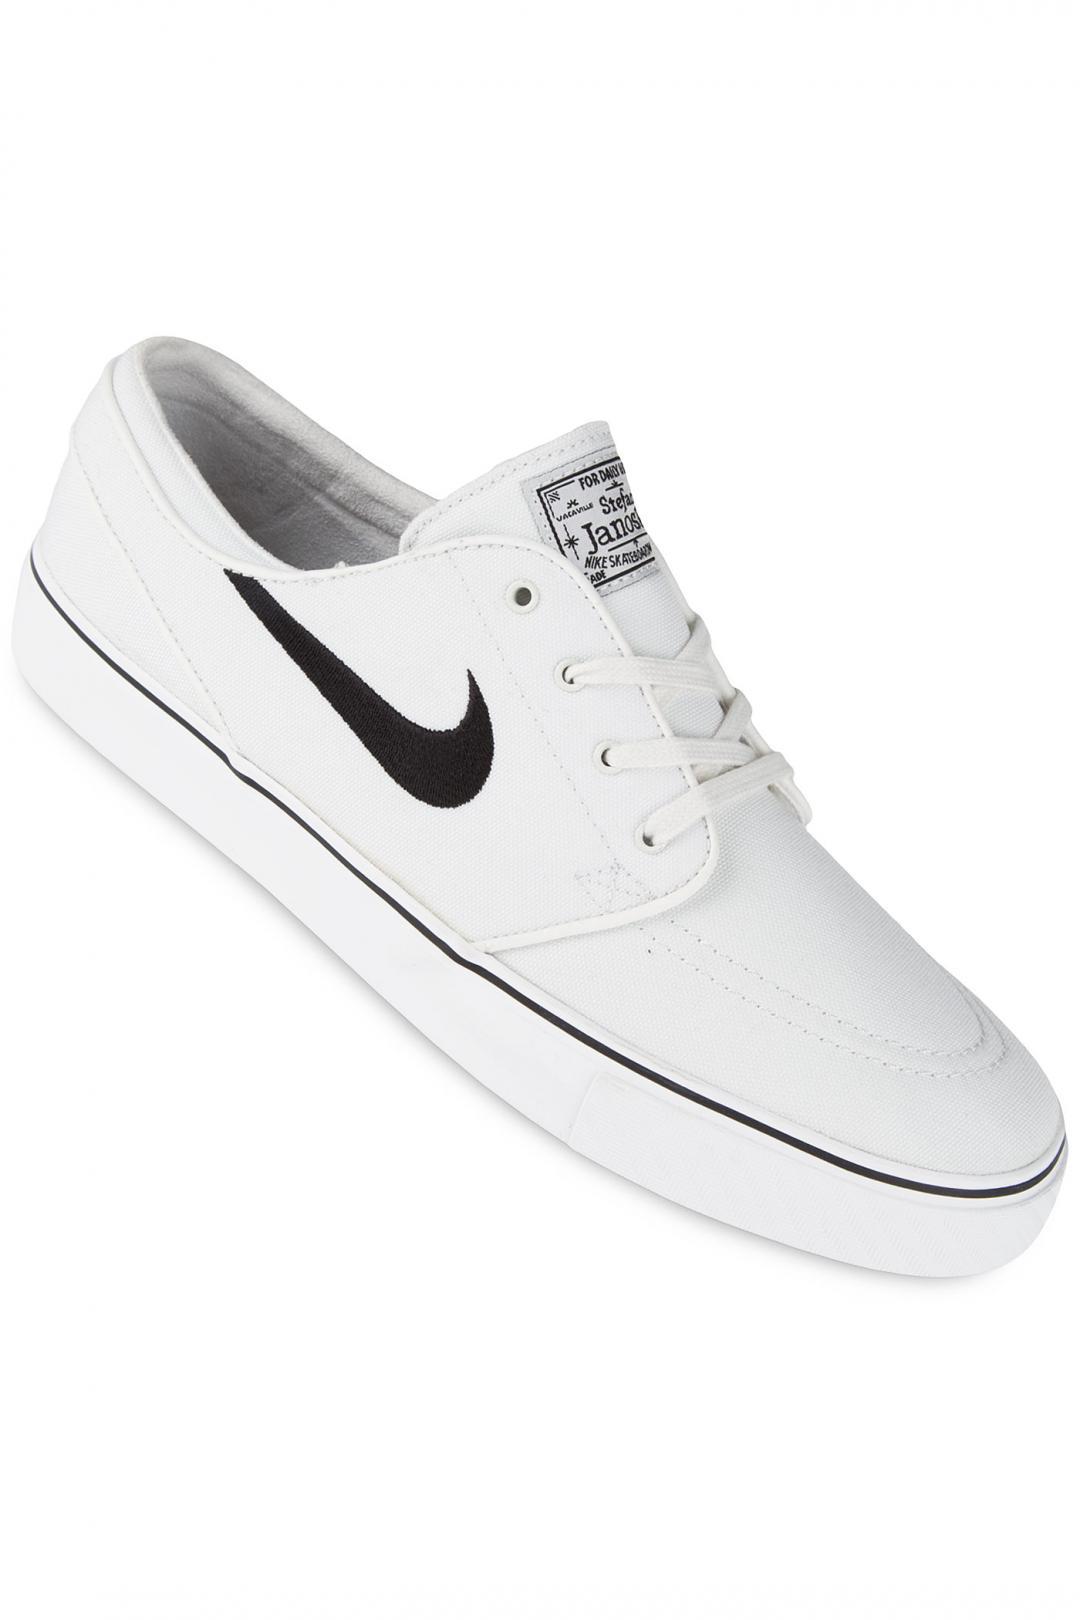 Uomo/Donna Nike SB Zoom Stefan Janoski Canvas summit white black | Sneakers low top